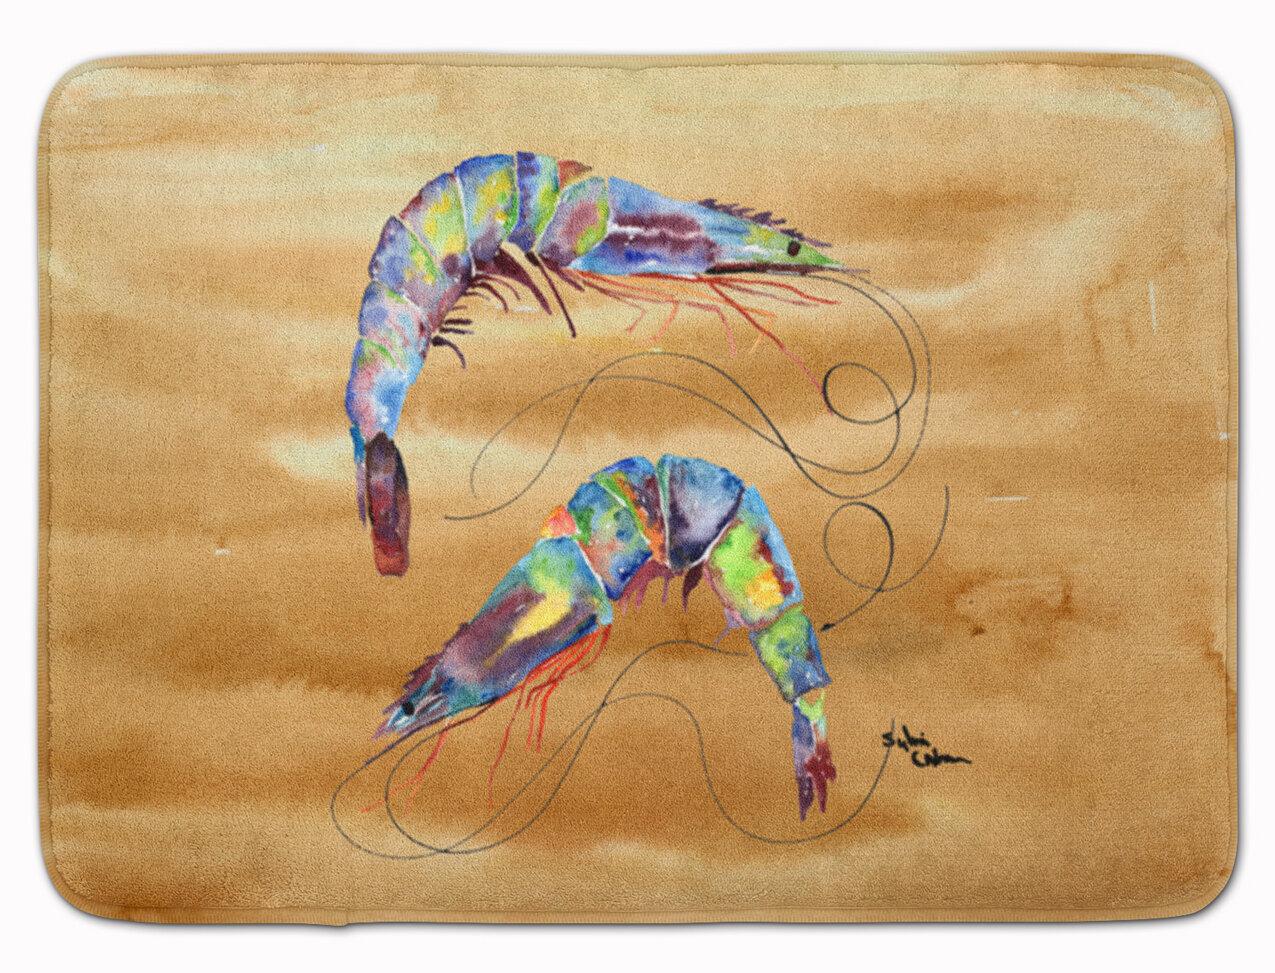 Longshore Tides Odin Shrimp Rectangle Microfiber Non Slip Bath Rug Wayfair